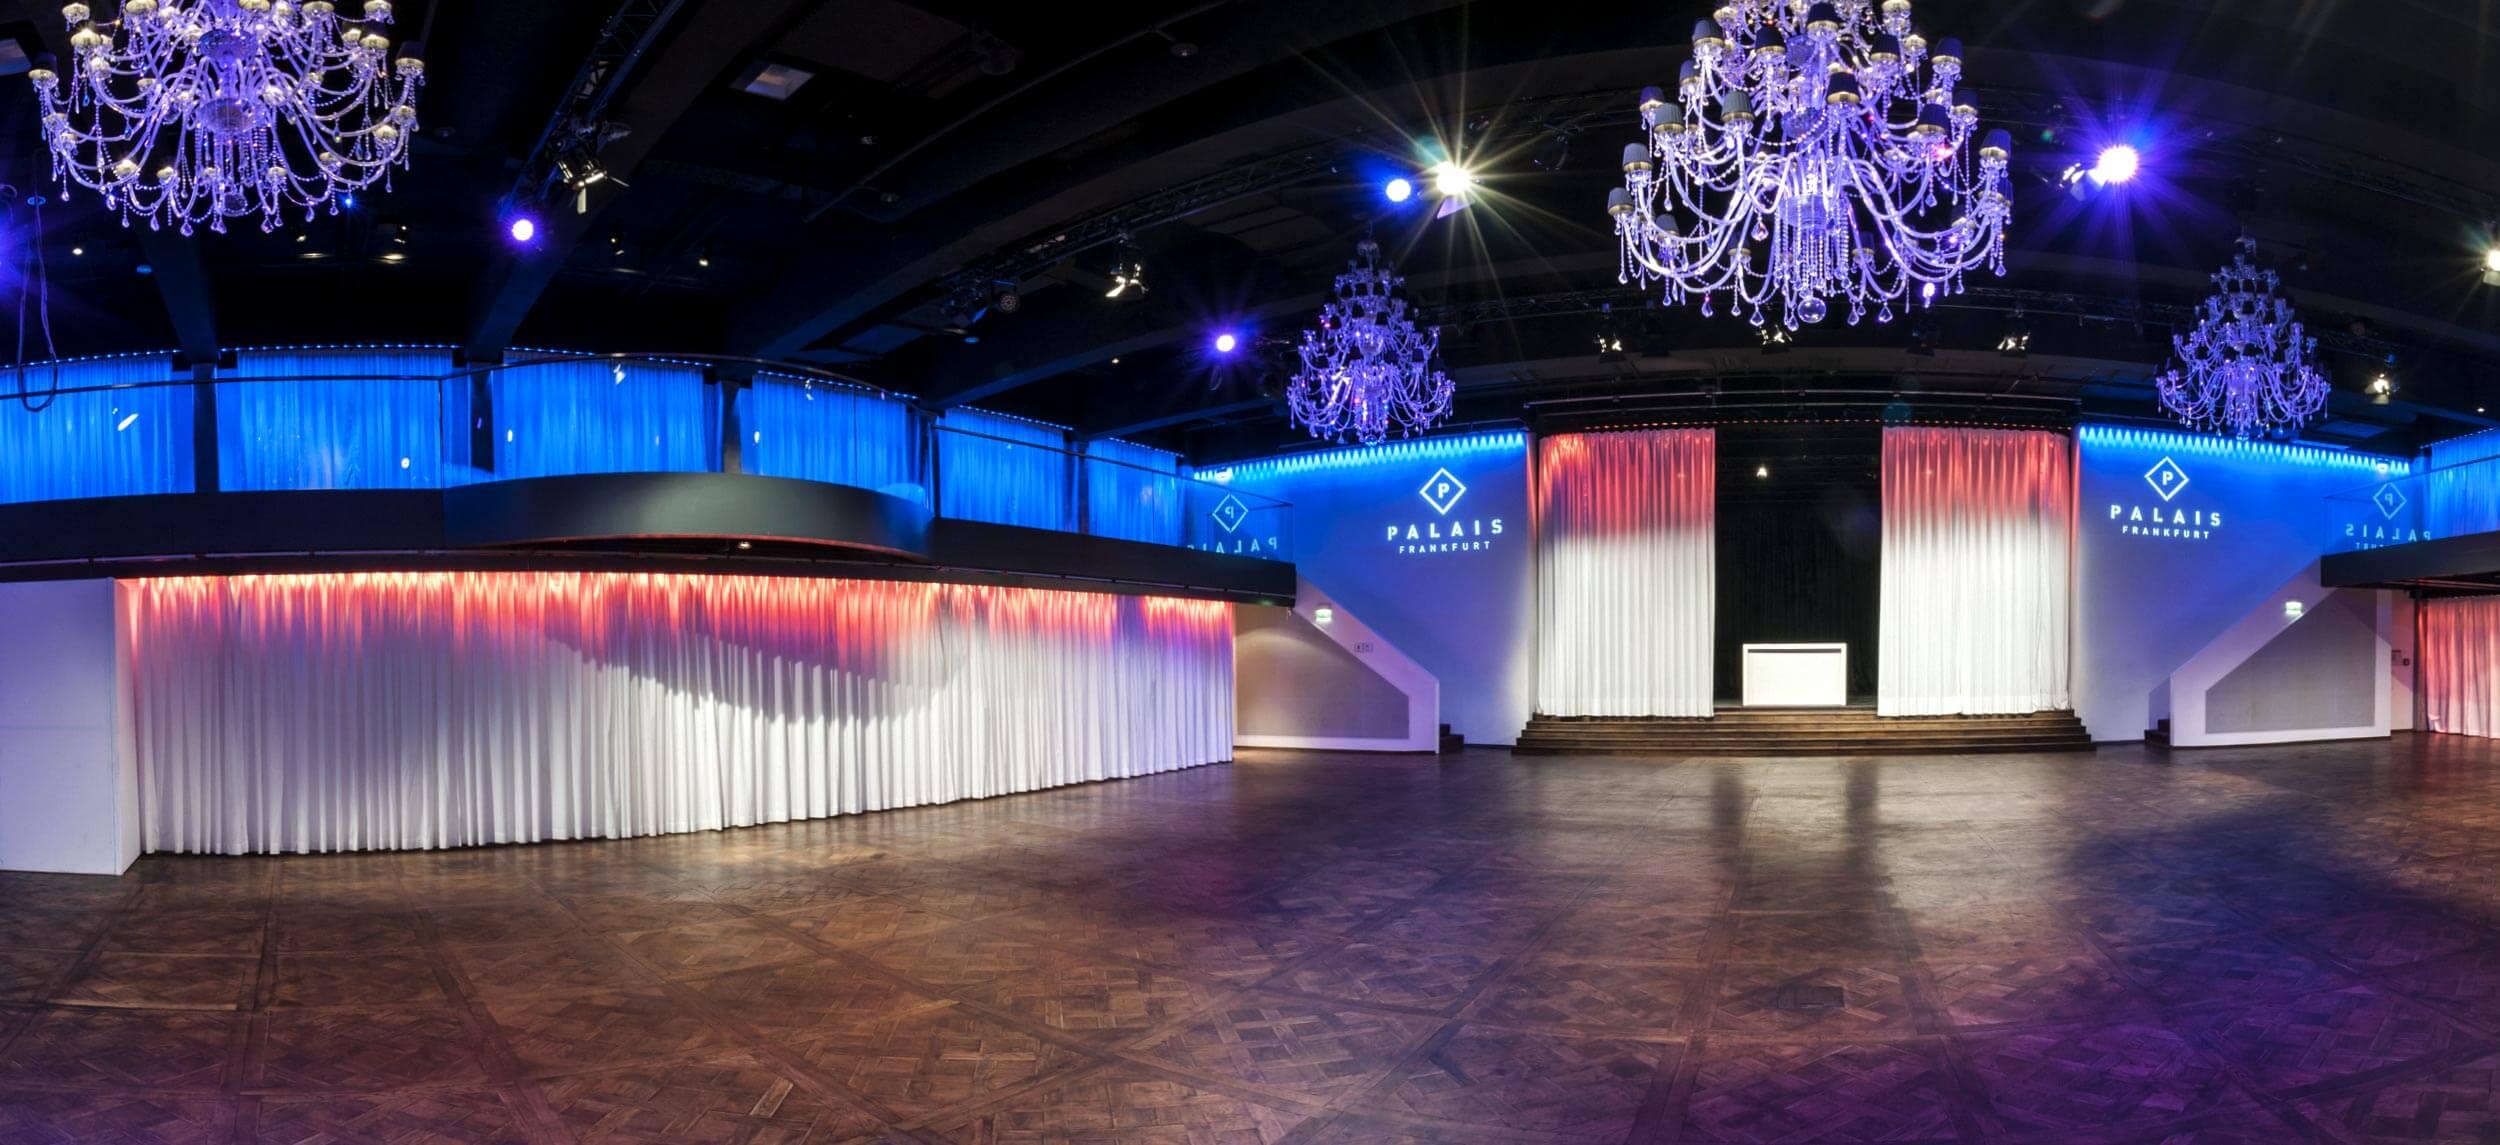 Virtuelle 360°-Tour Palais Frankfurt am Main für KOFLER & KOMPANIE